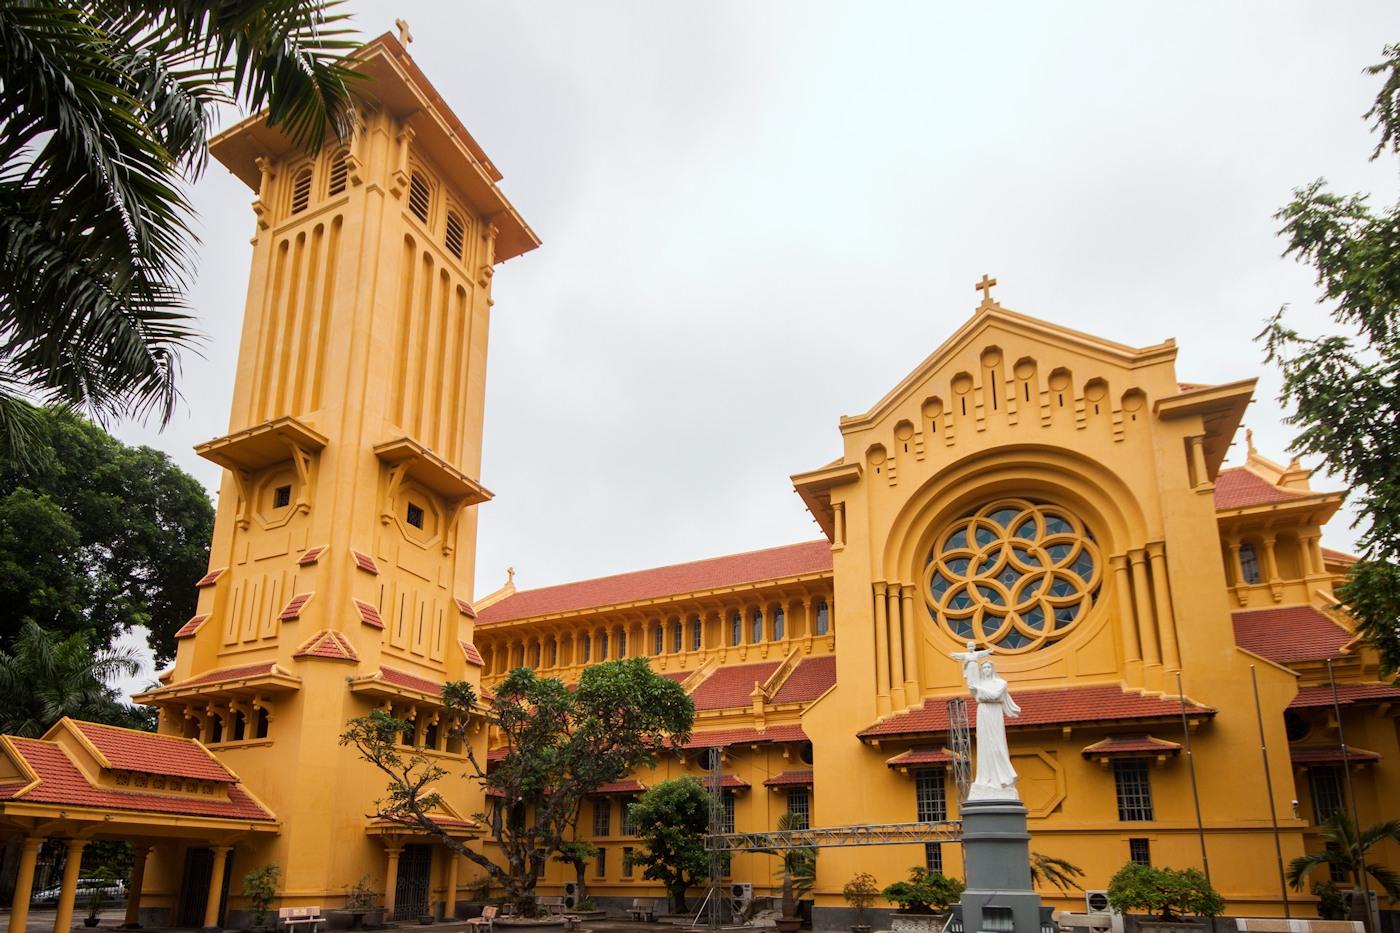 10. Cua Bac Church